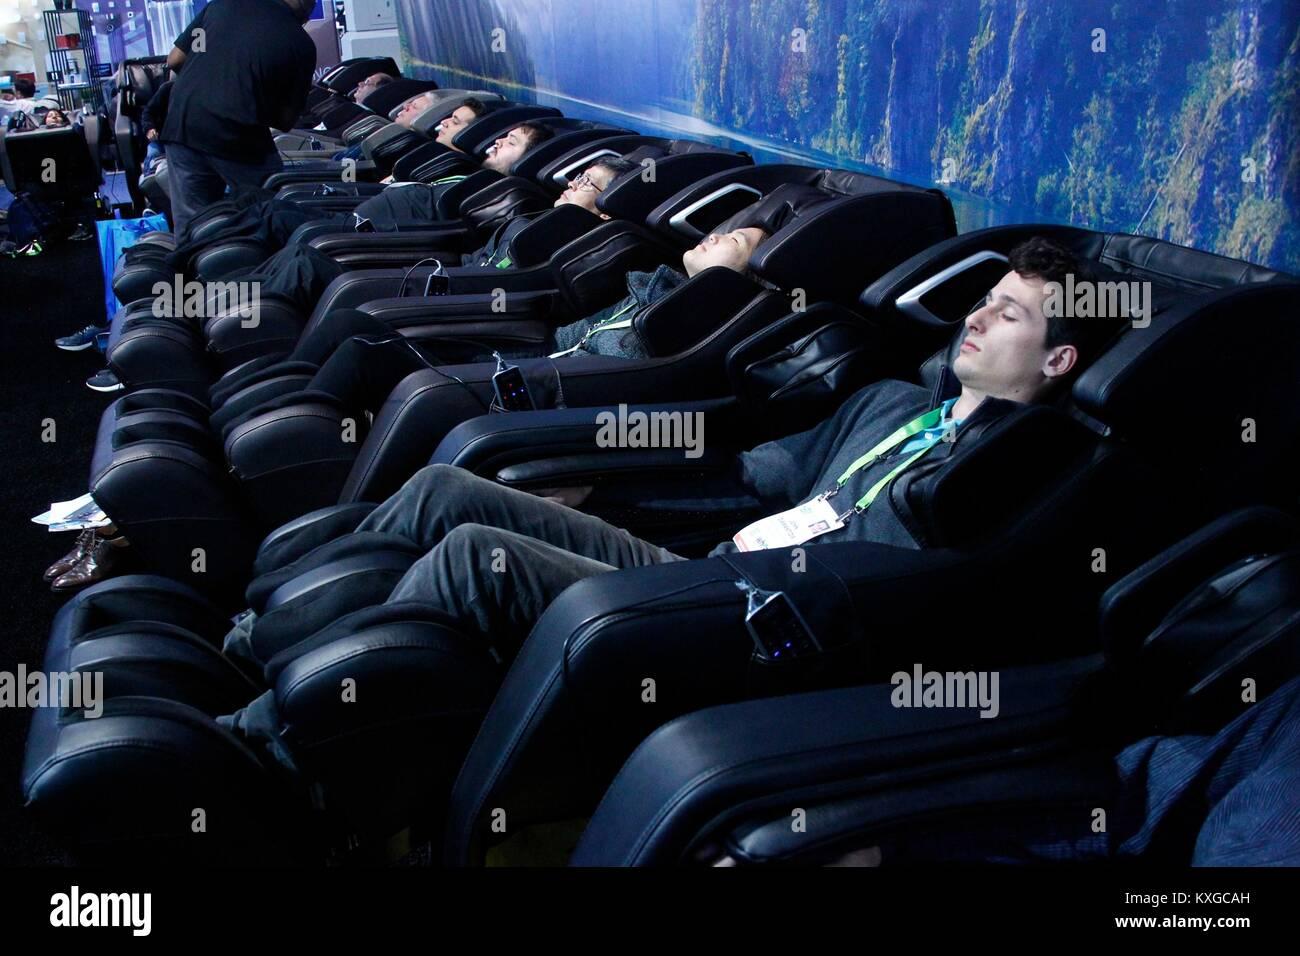 Las Vegas Nv Usa 9th Jan 2018 Luxury Full Body Massage Chairs